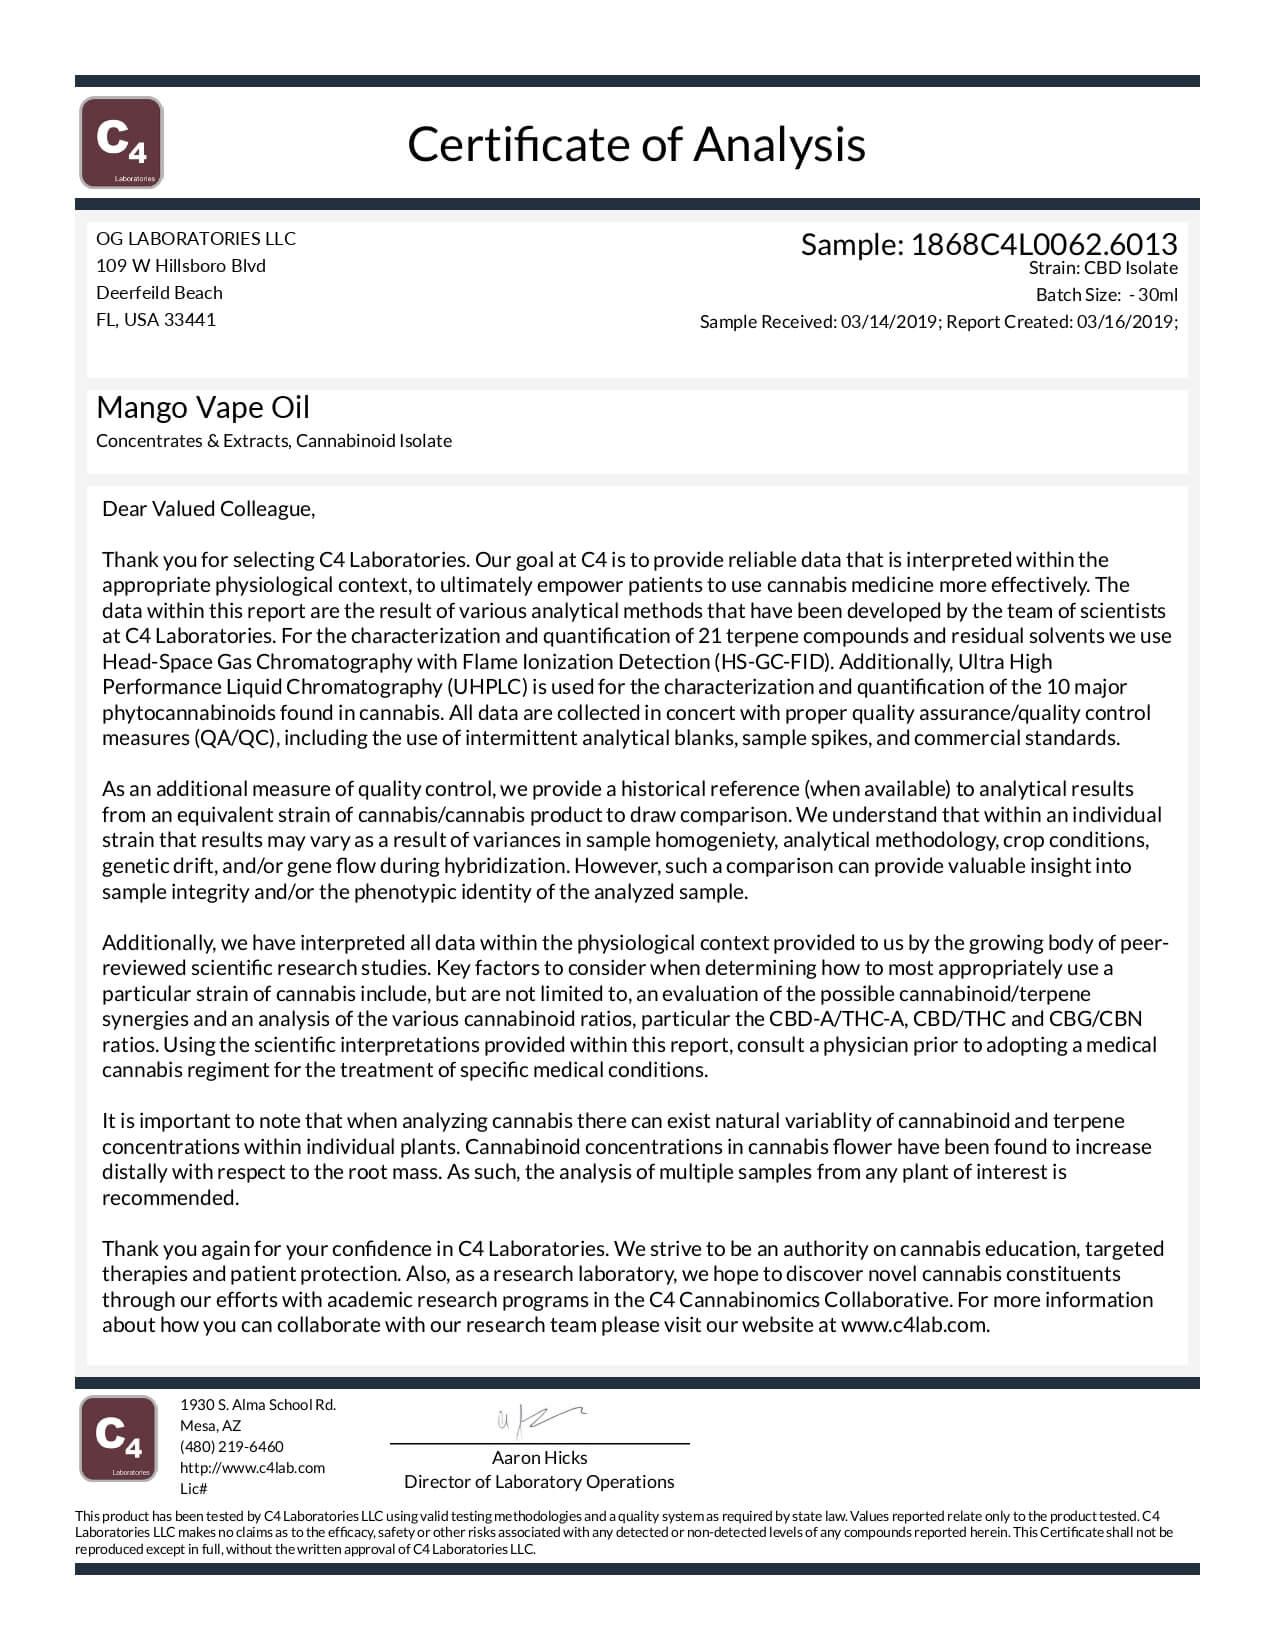 OG Labs CBD Vape Juice Mango 600mg Lab Report